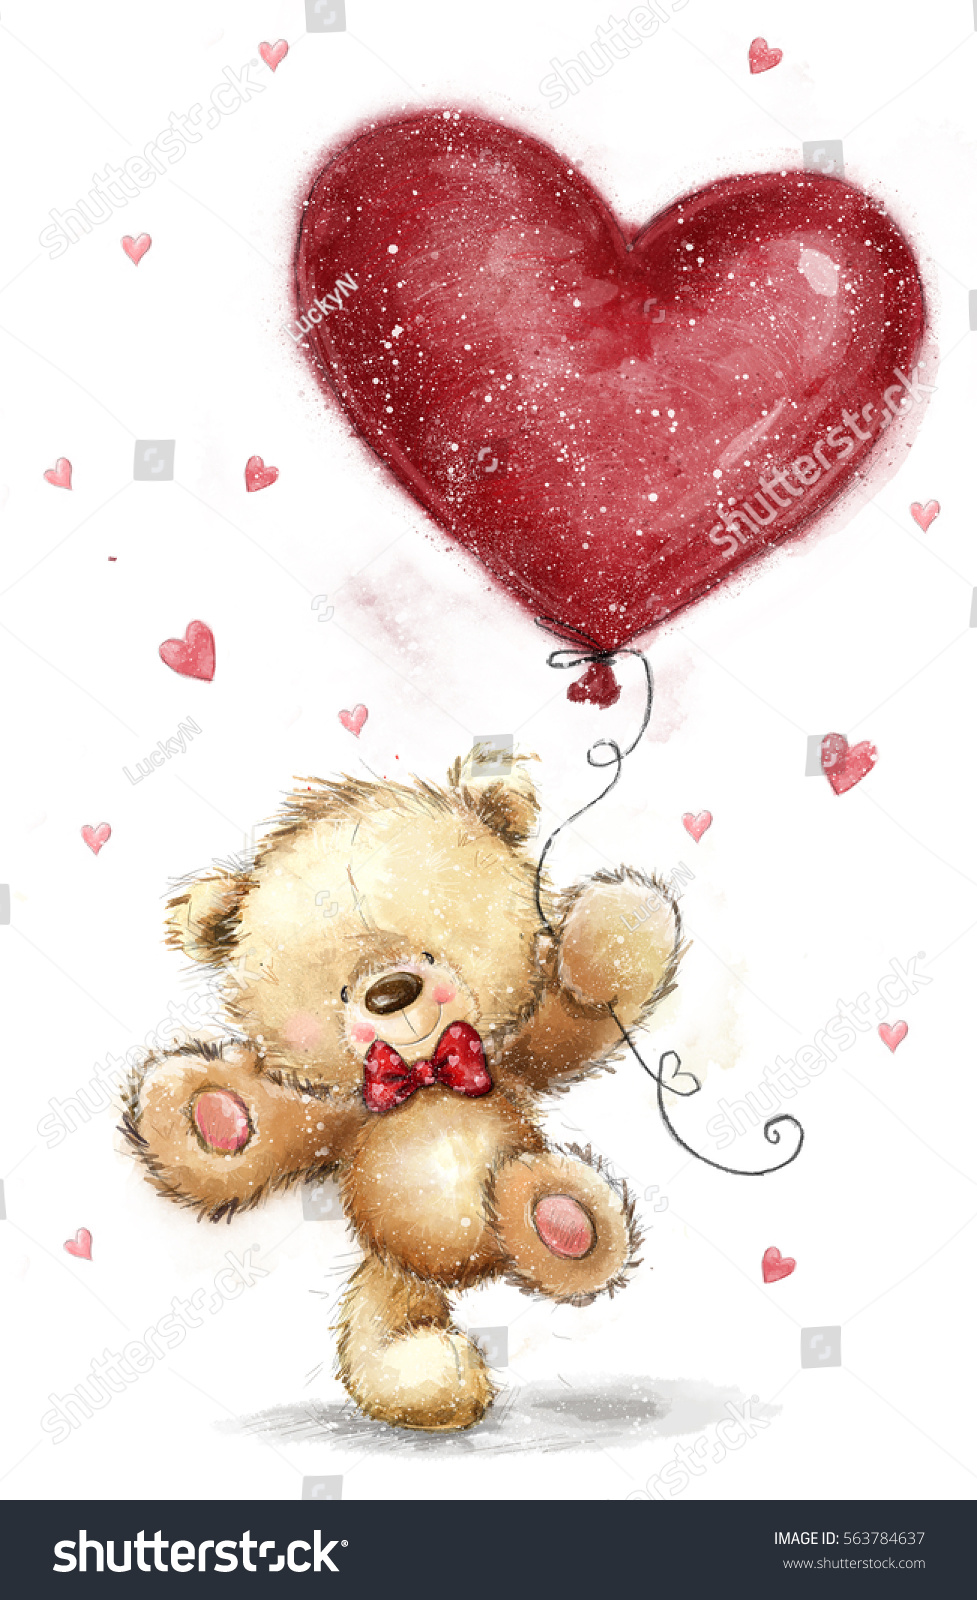 Cute bear big red heart love 563784637 shutterstock voltagebd Images